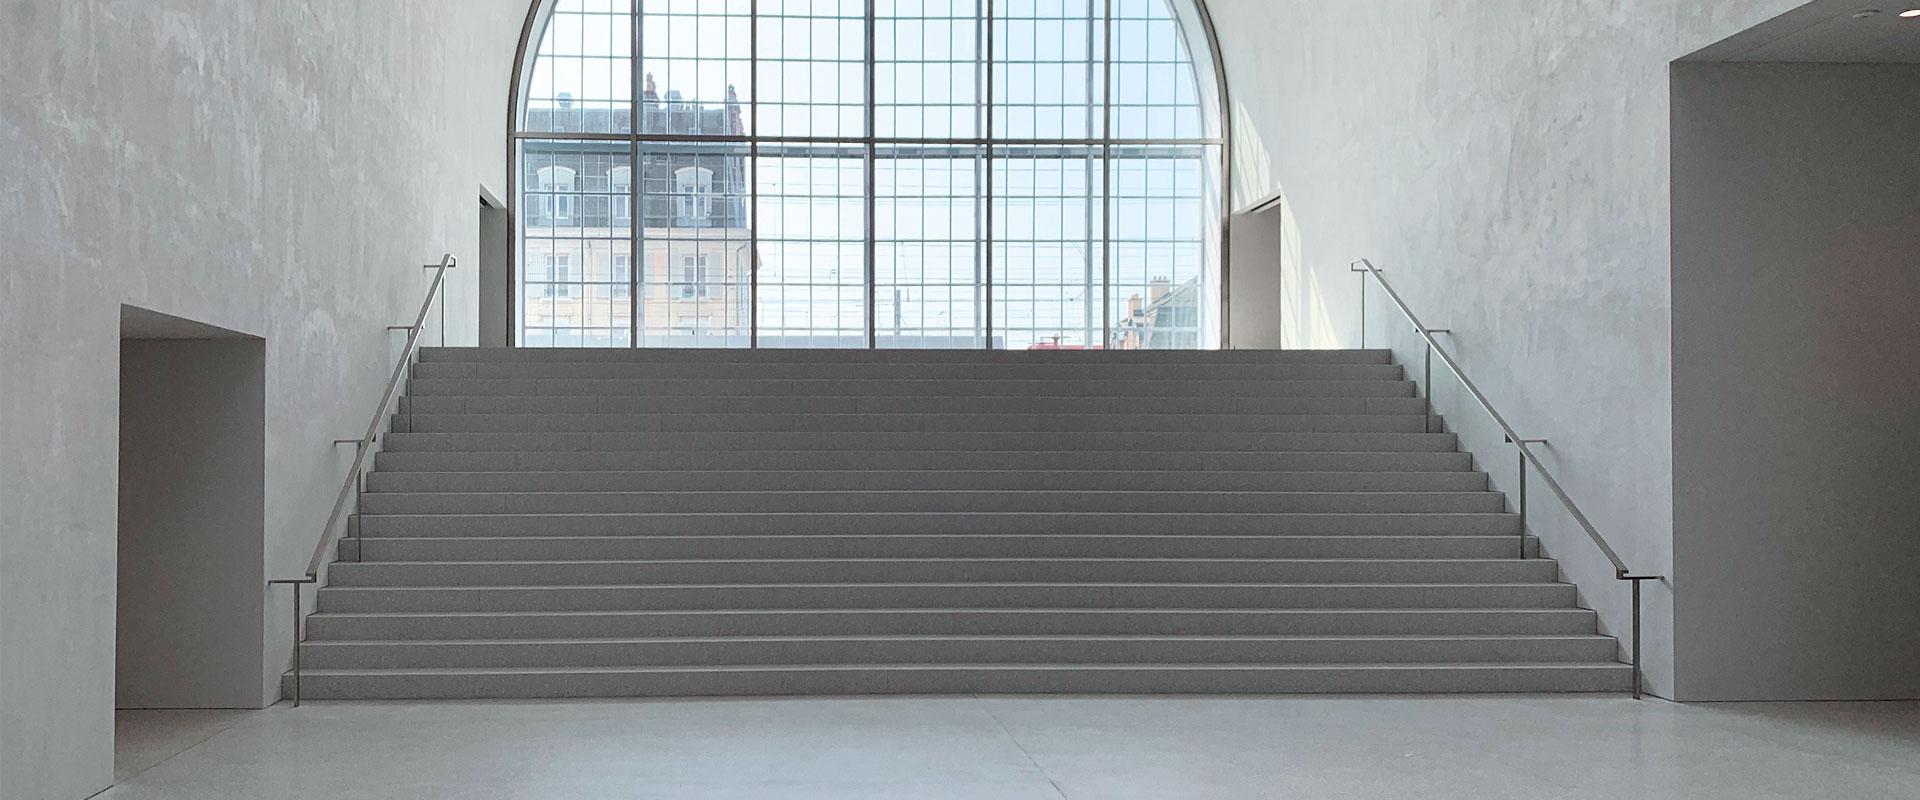 musee-cantonal-des-beaux-arts---losanna-switzerland---custom-REG-3620---pubblico-03---OK